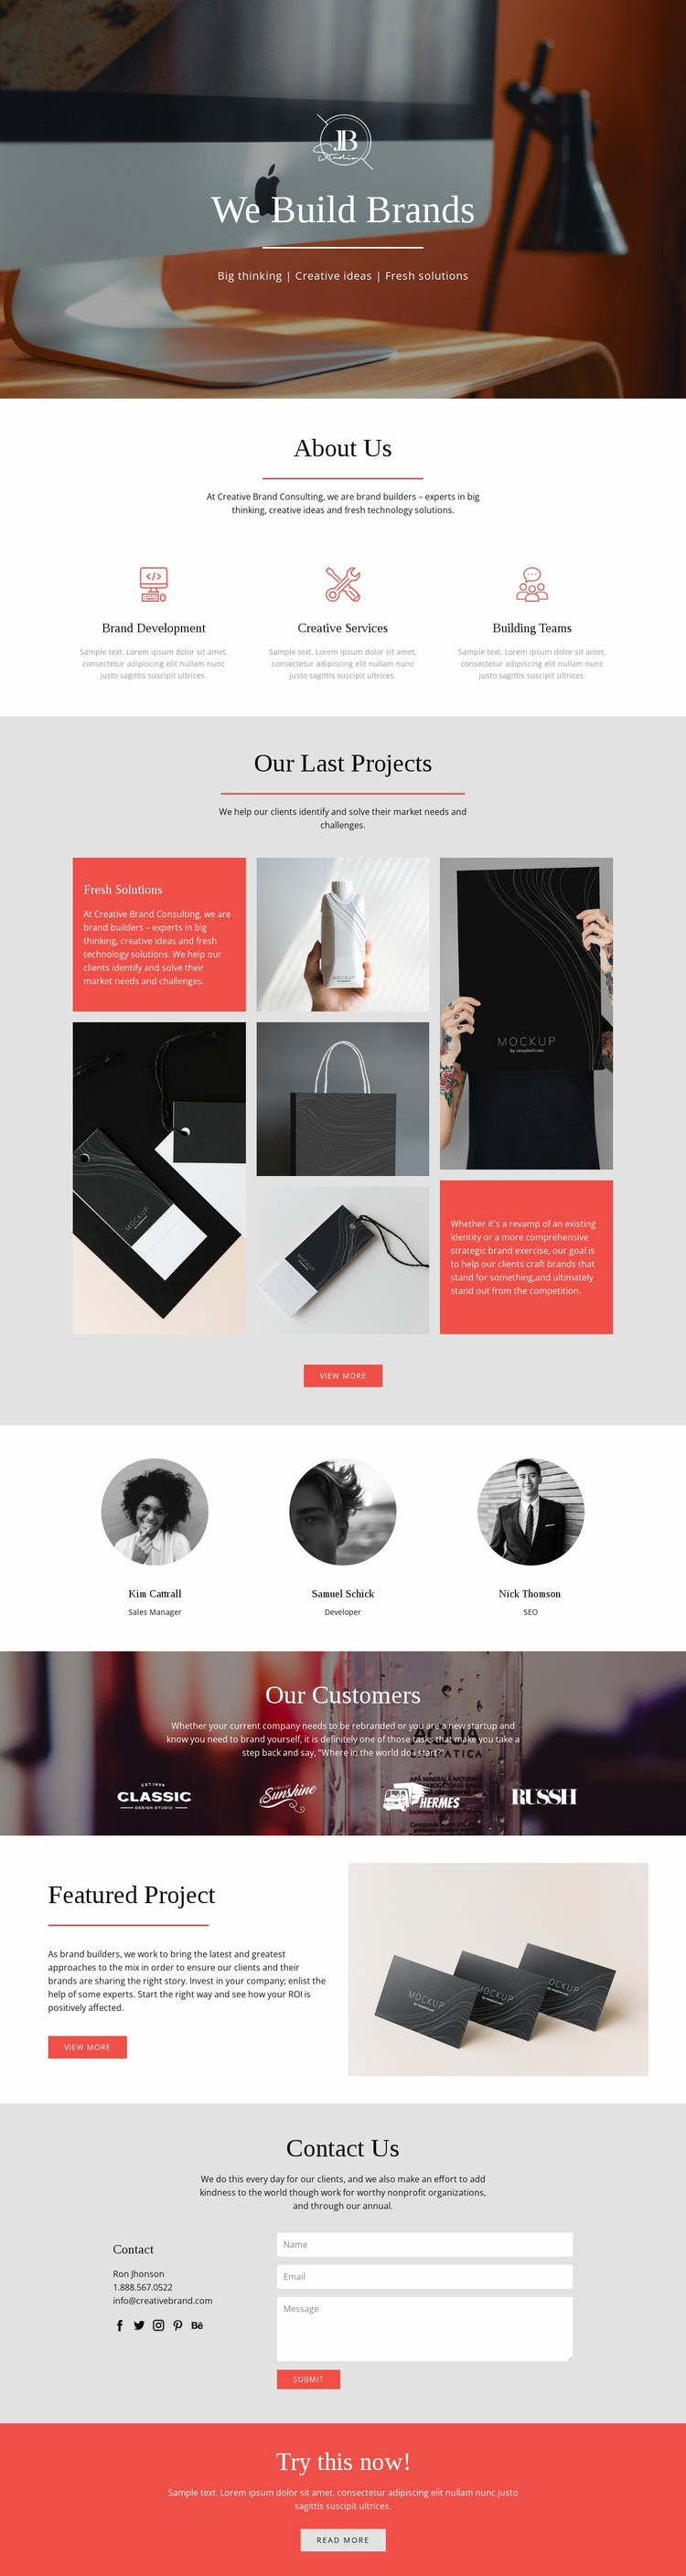 Business Agency Web Design